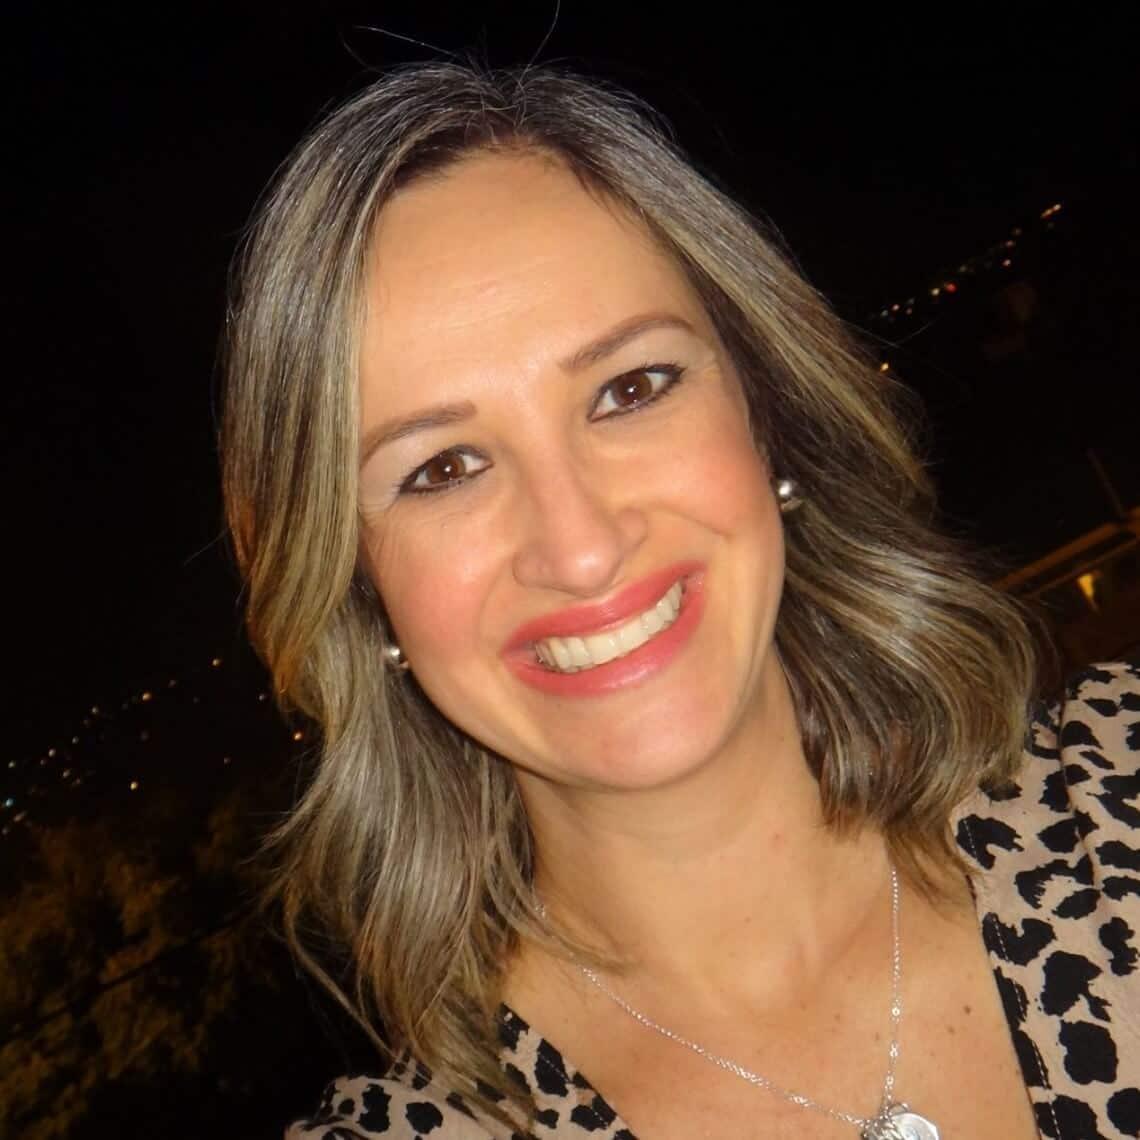 - Juliana Moura De Masi